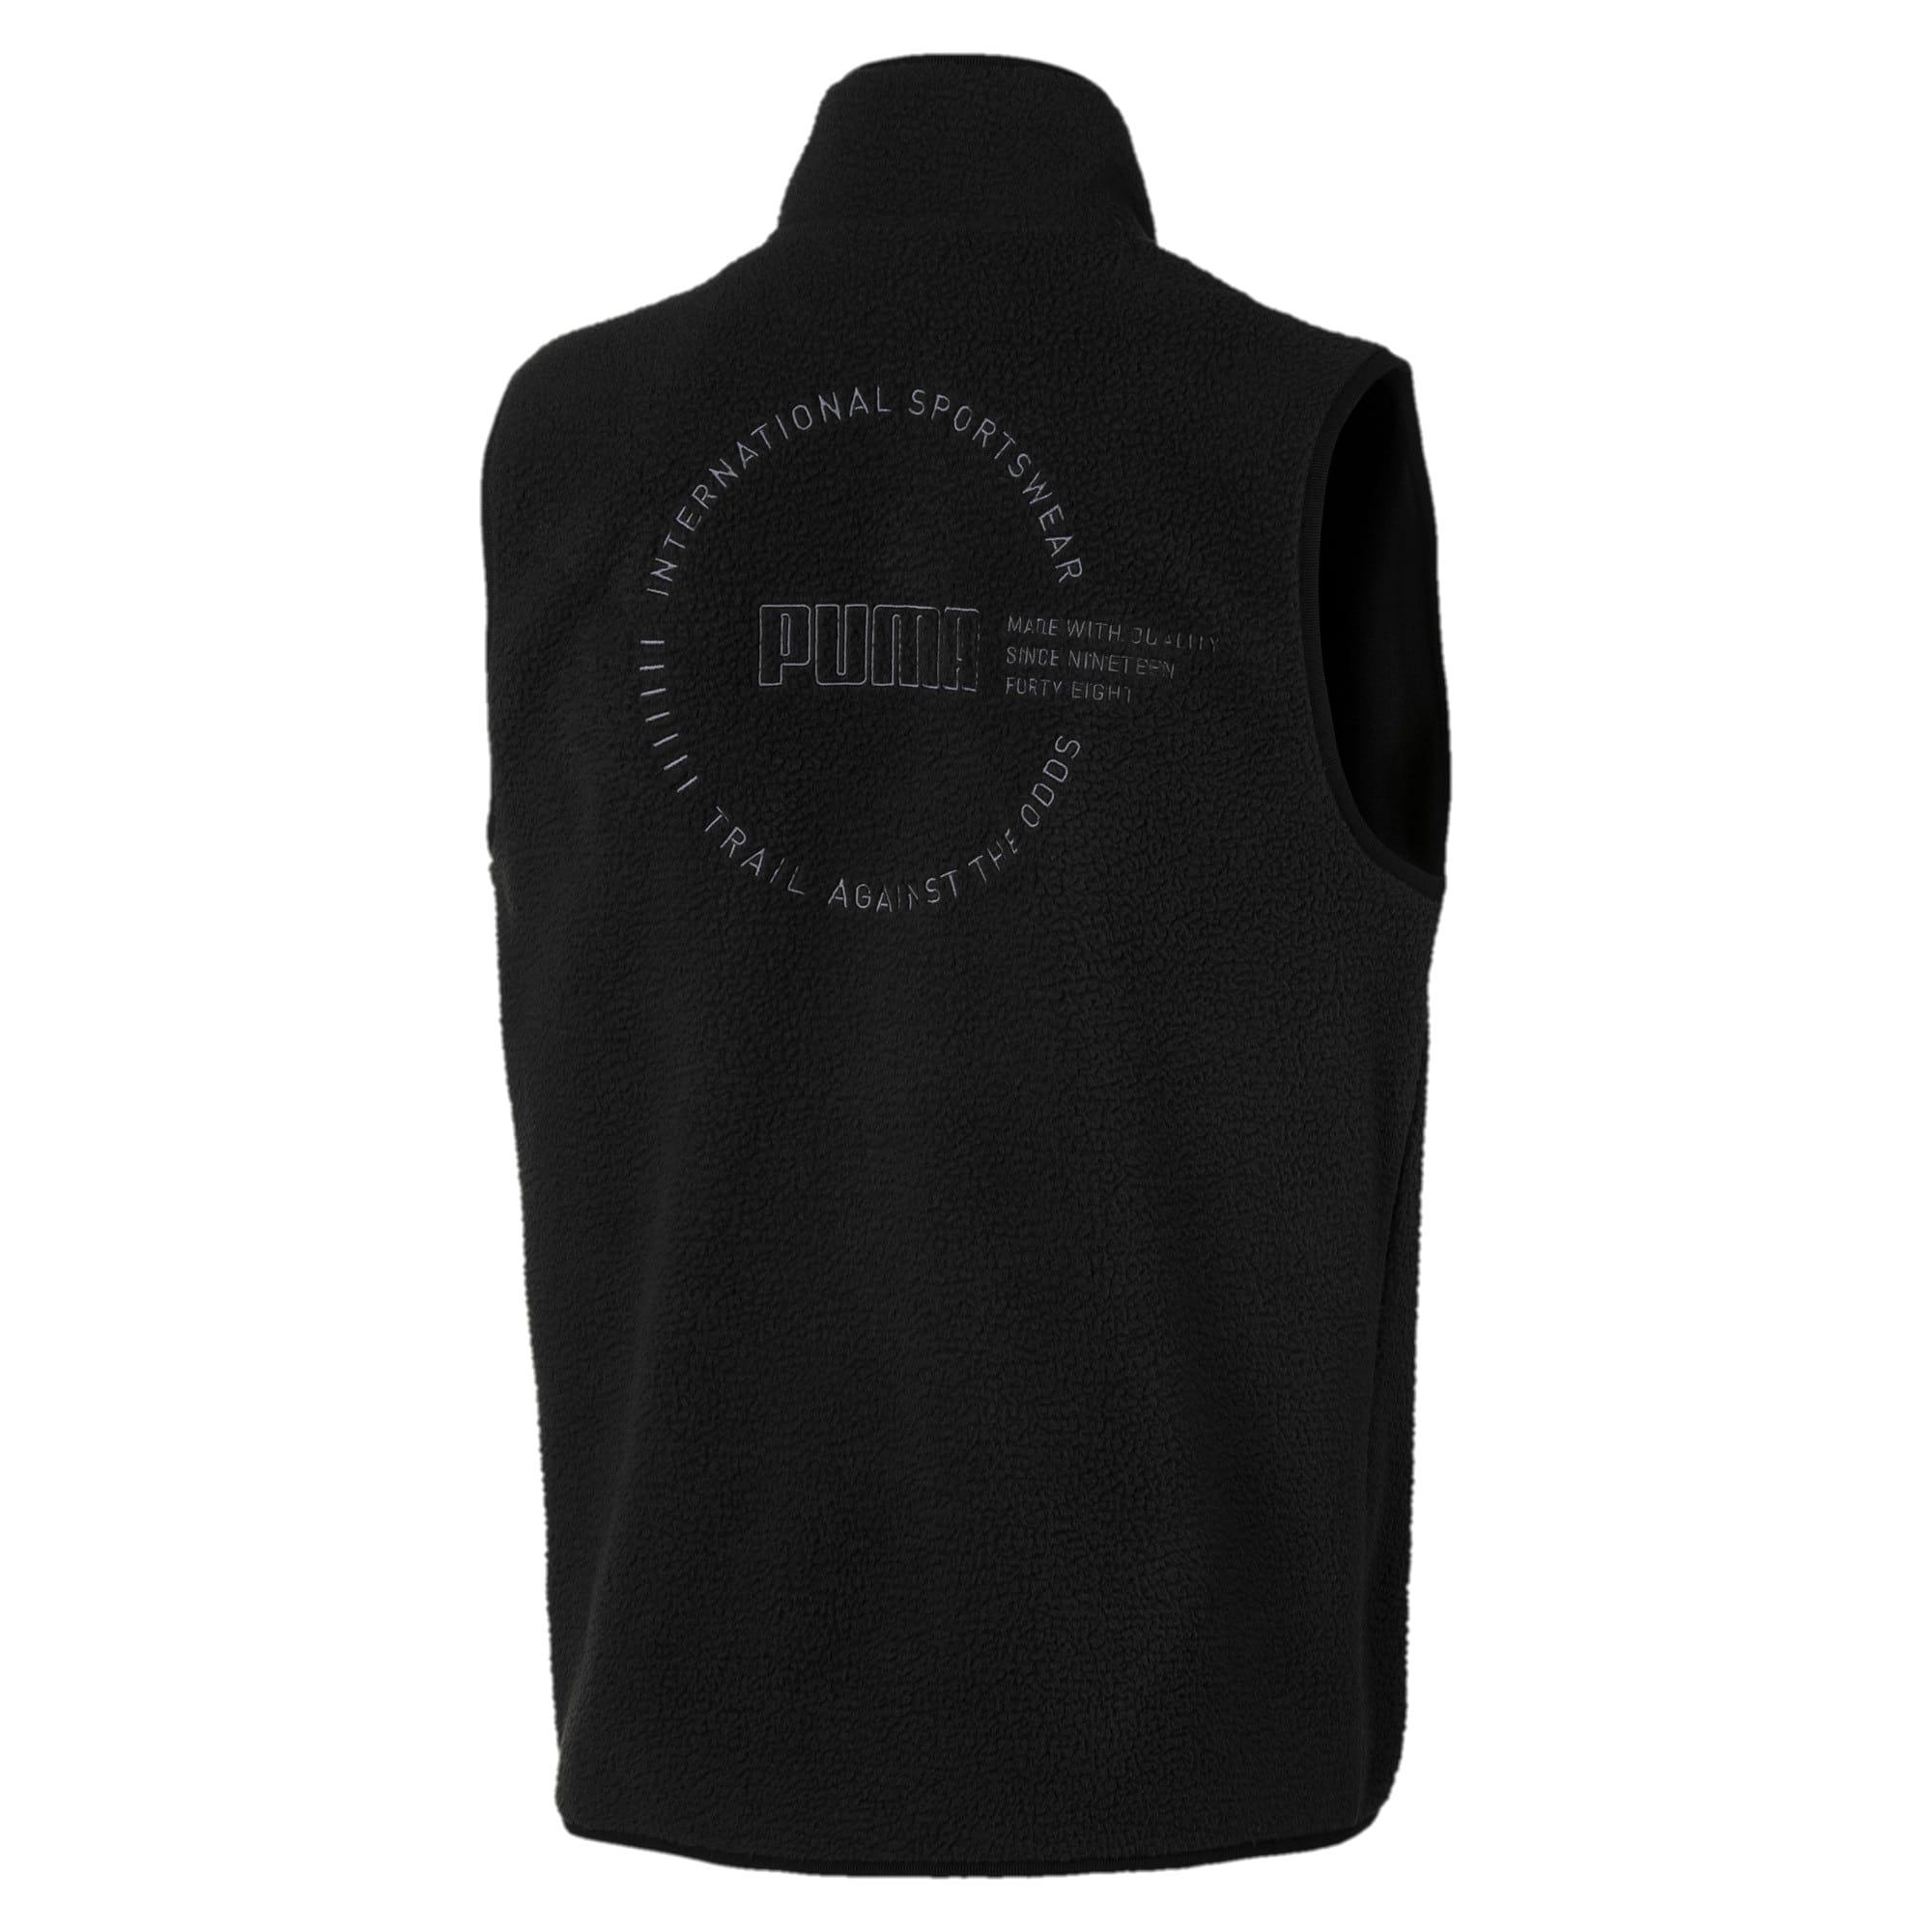 Thumbnail 2 of XTG Trail Fleece Full Zip Men's Pocket Gilet, Puma Black, medium